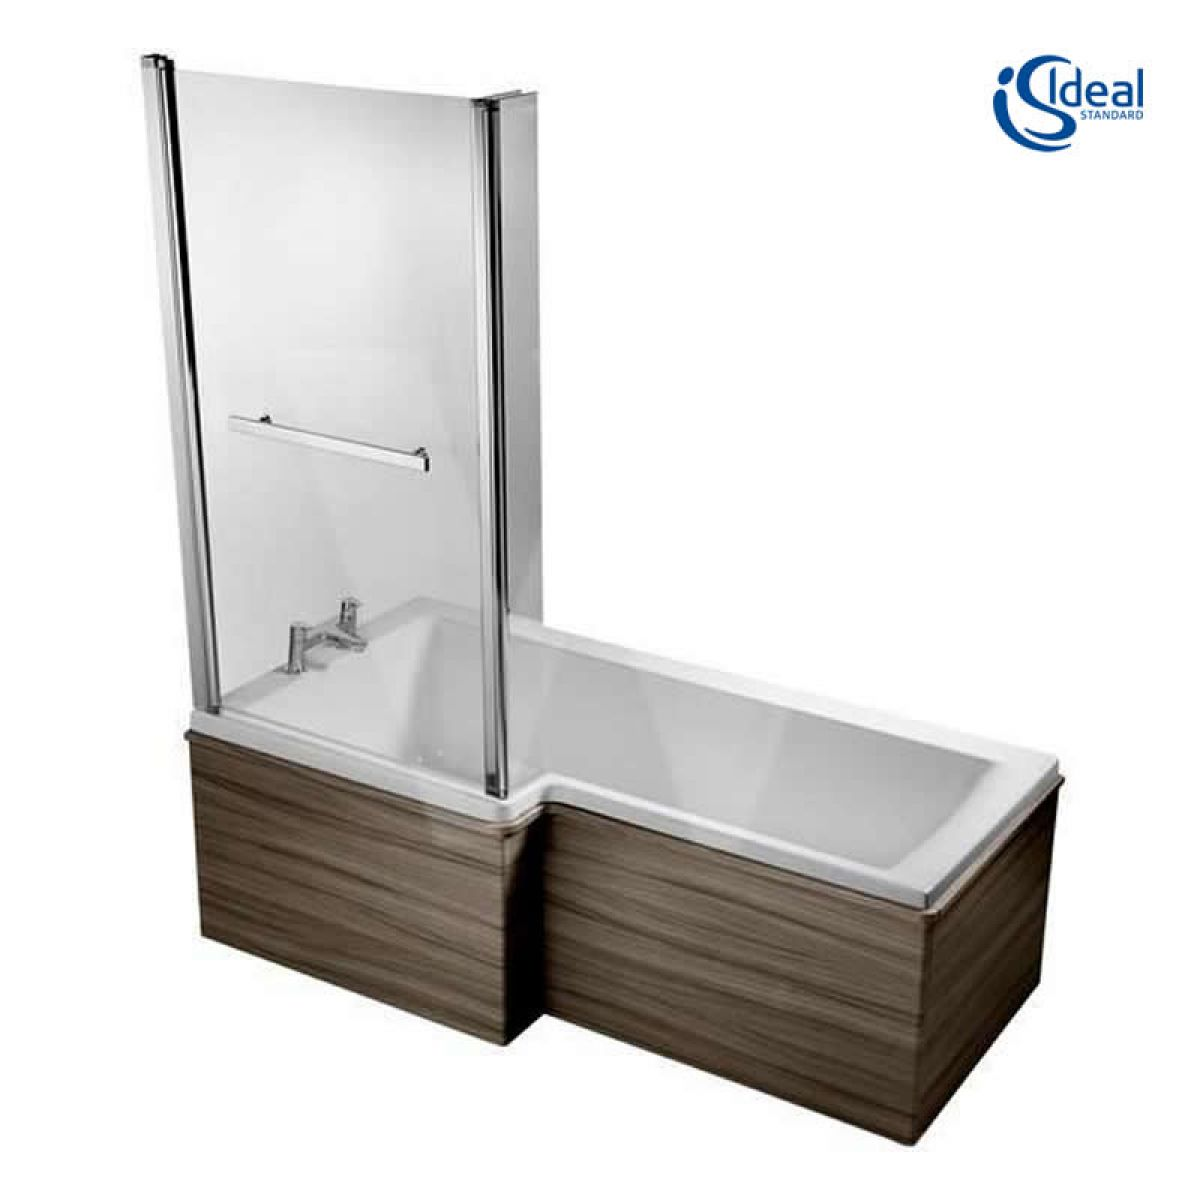 ideal standard concept space 1700mm square shower bath ideal standard concept air idealform 170x80cm shower bath